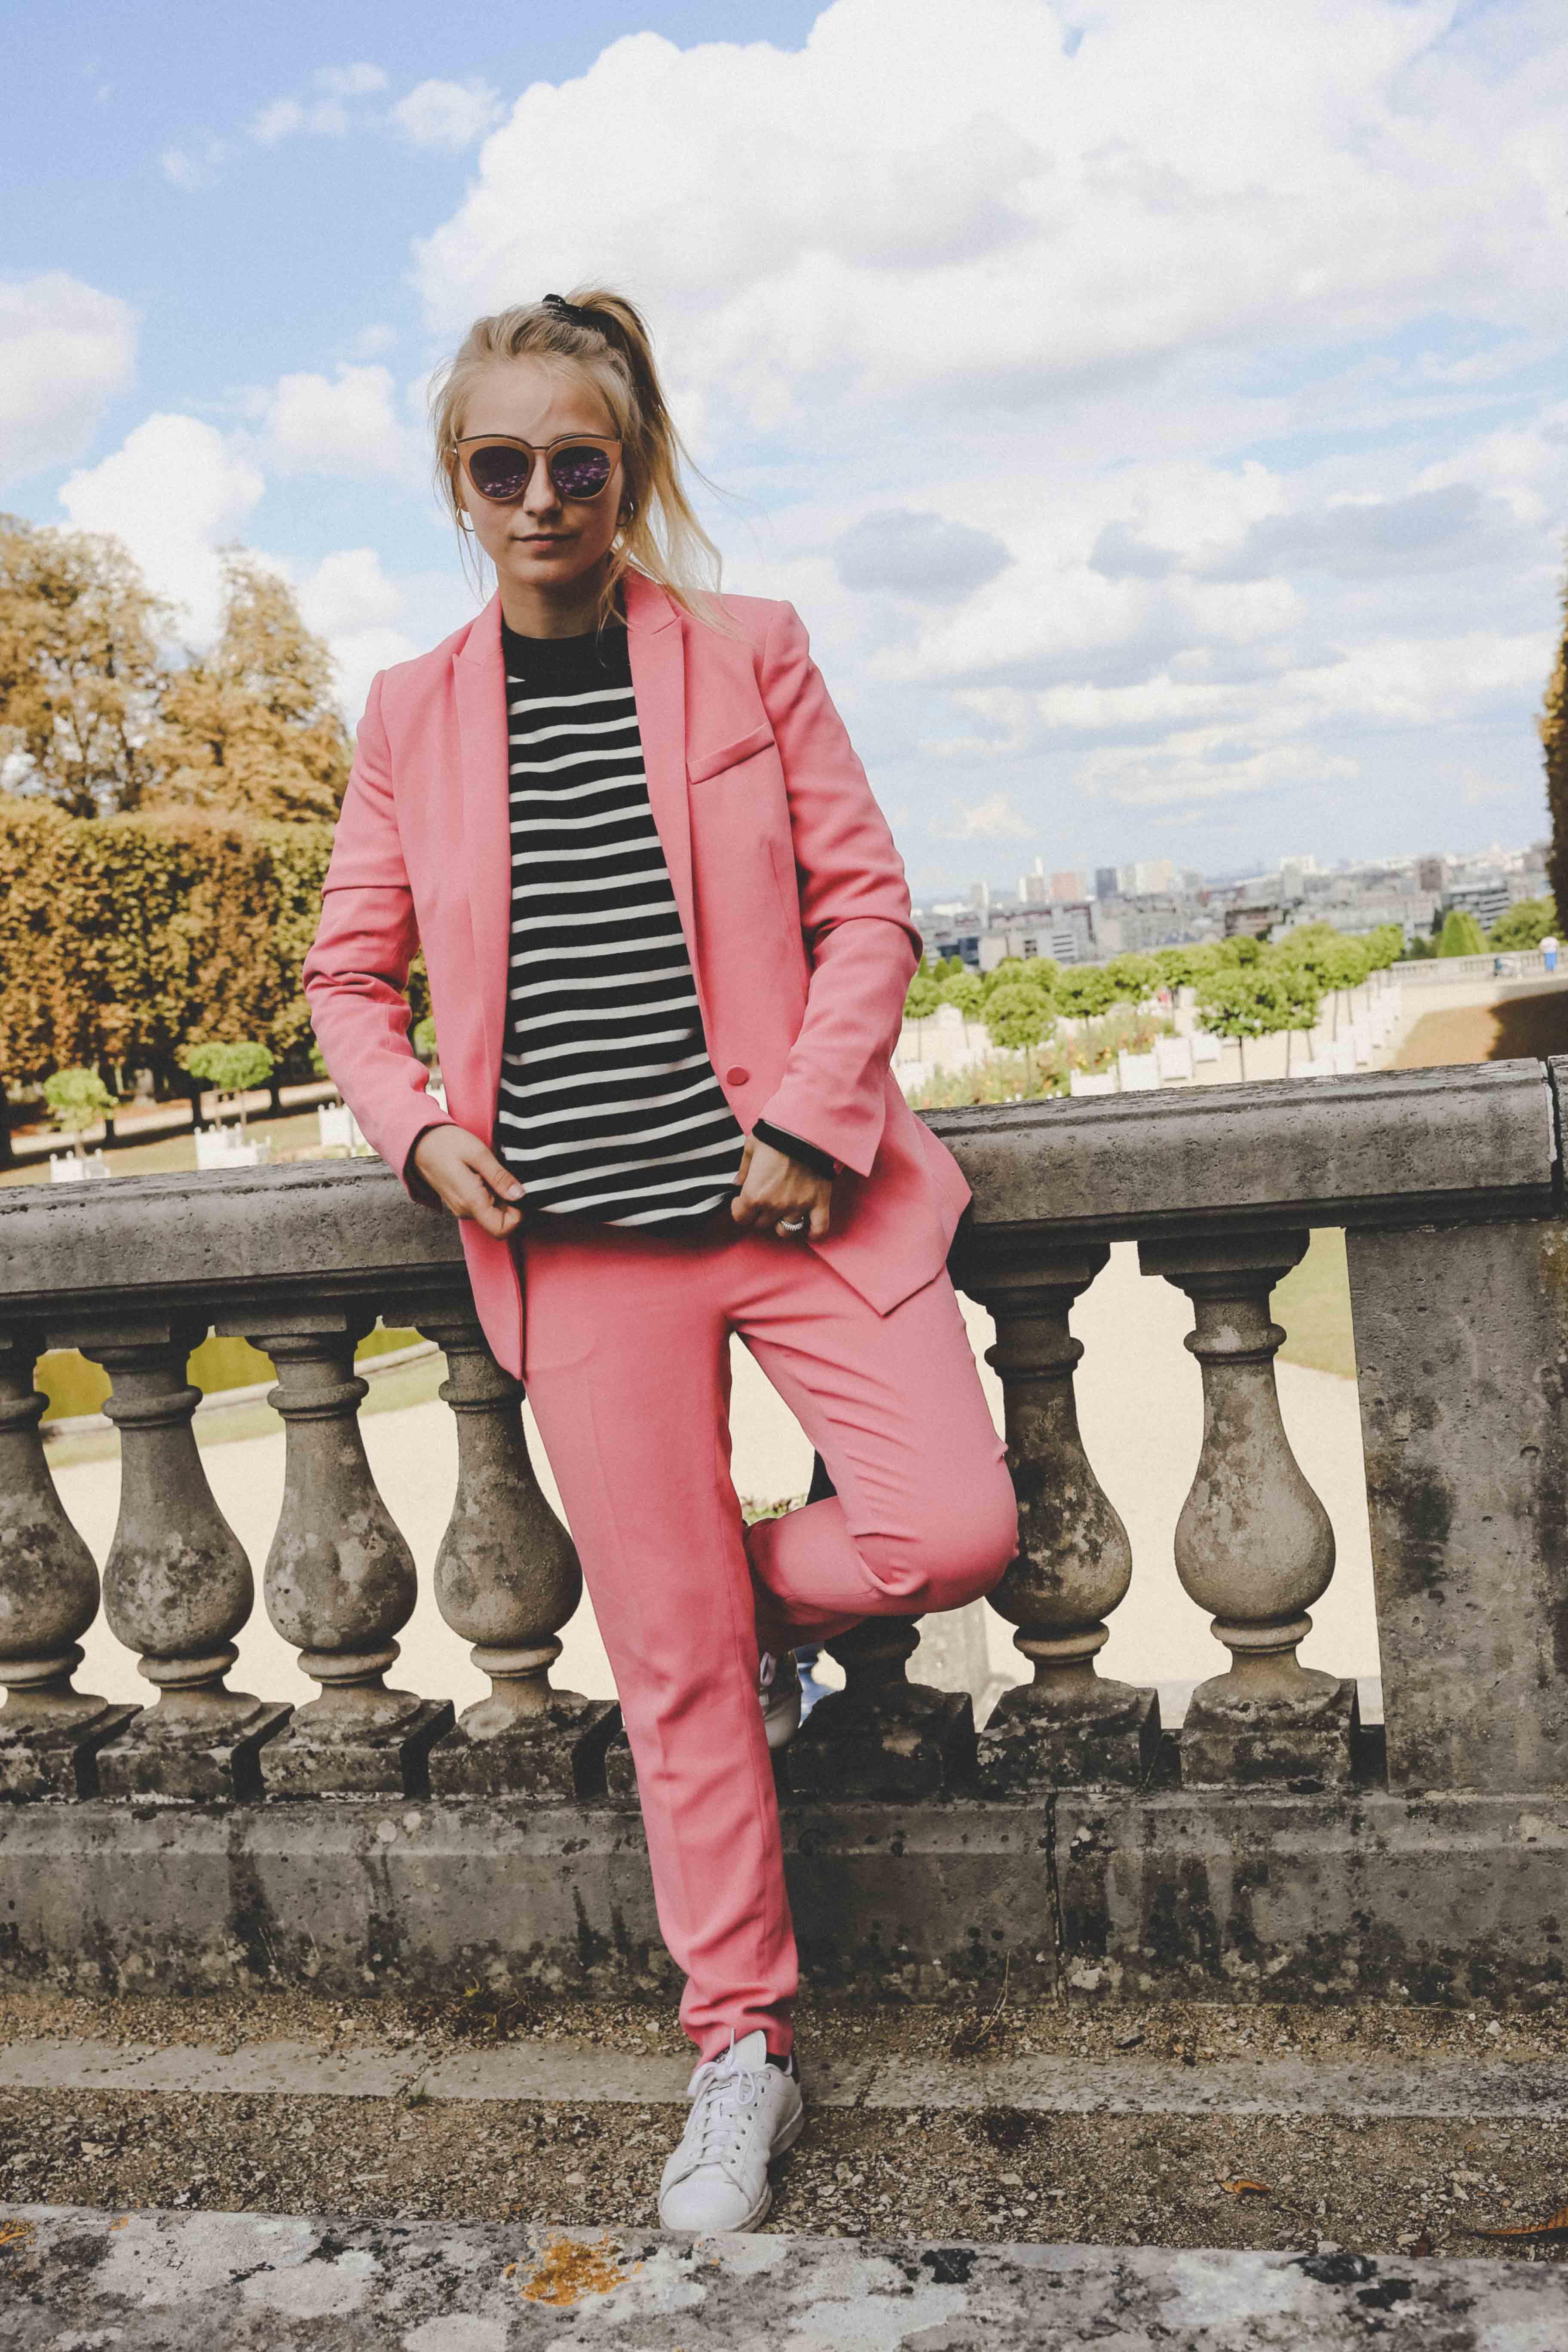 trendreport-pinker-hosenanzug-pink-suit-how-to-paris-fashionblog-modeblog-outfit_1862